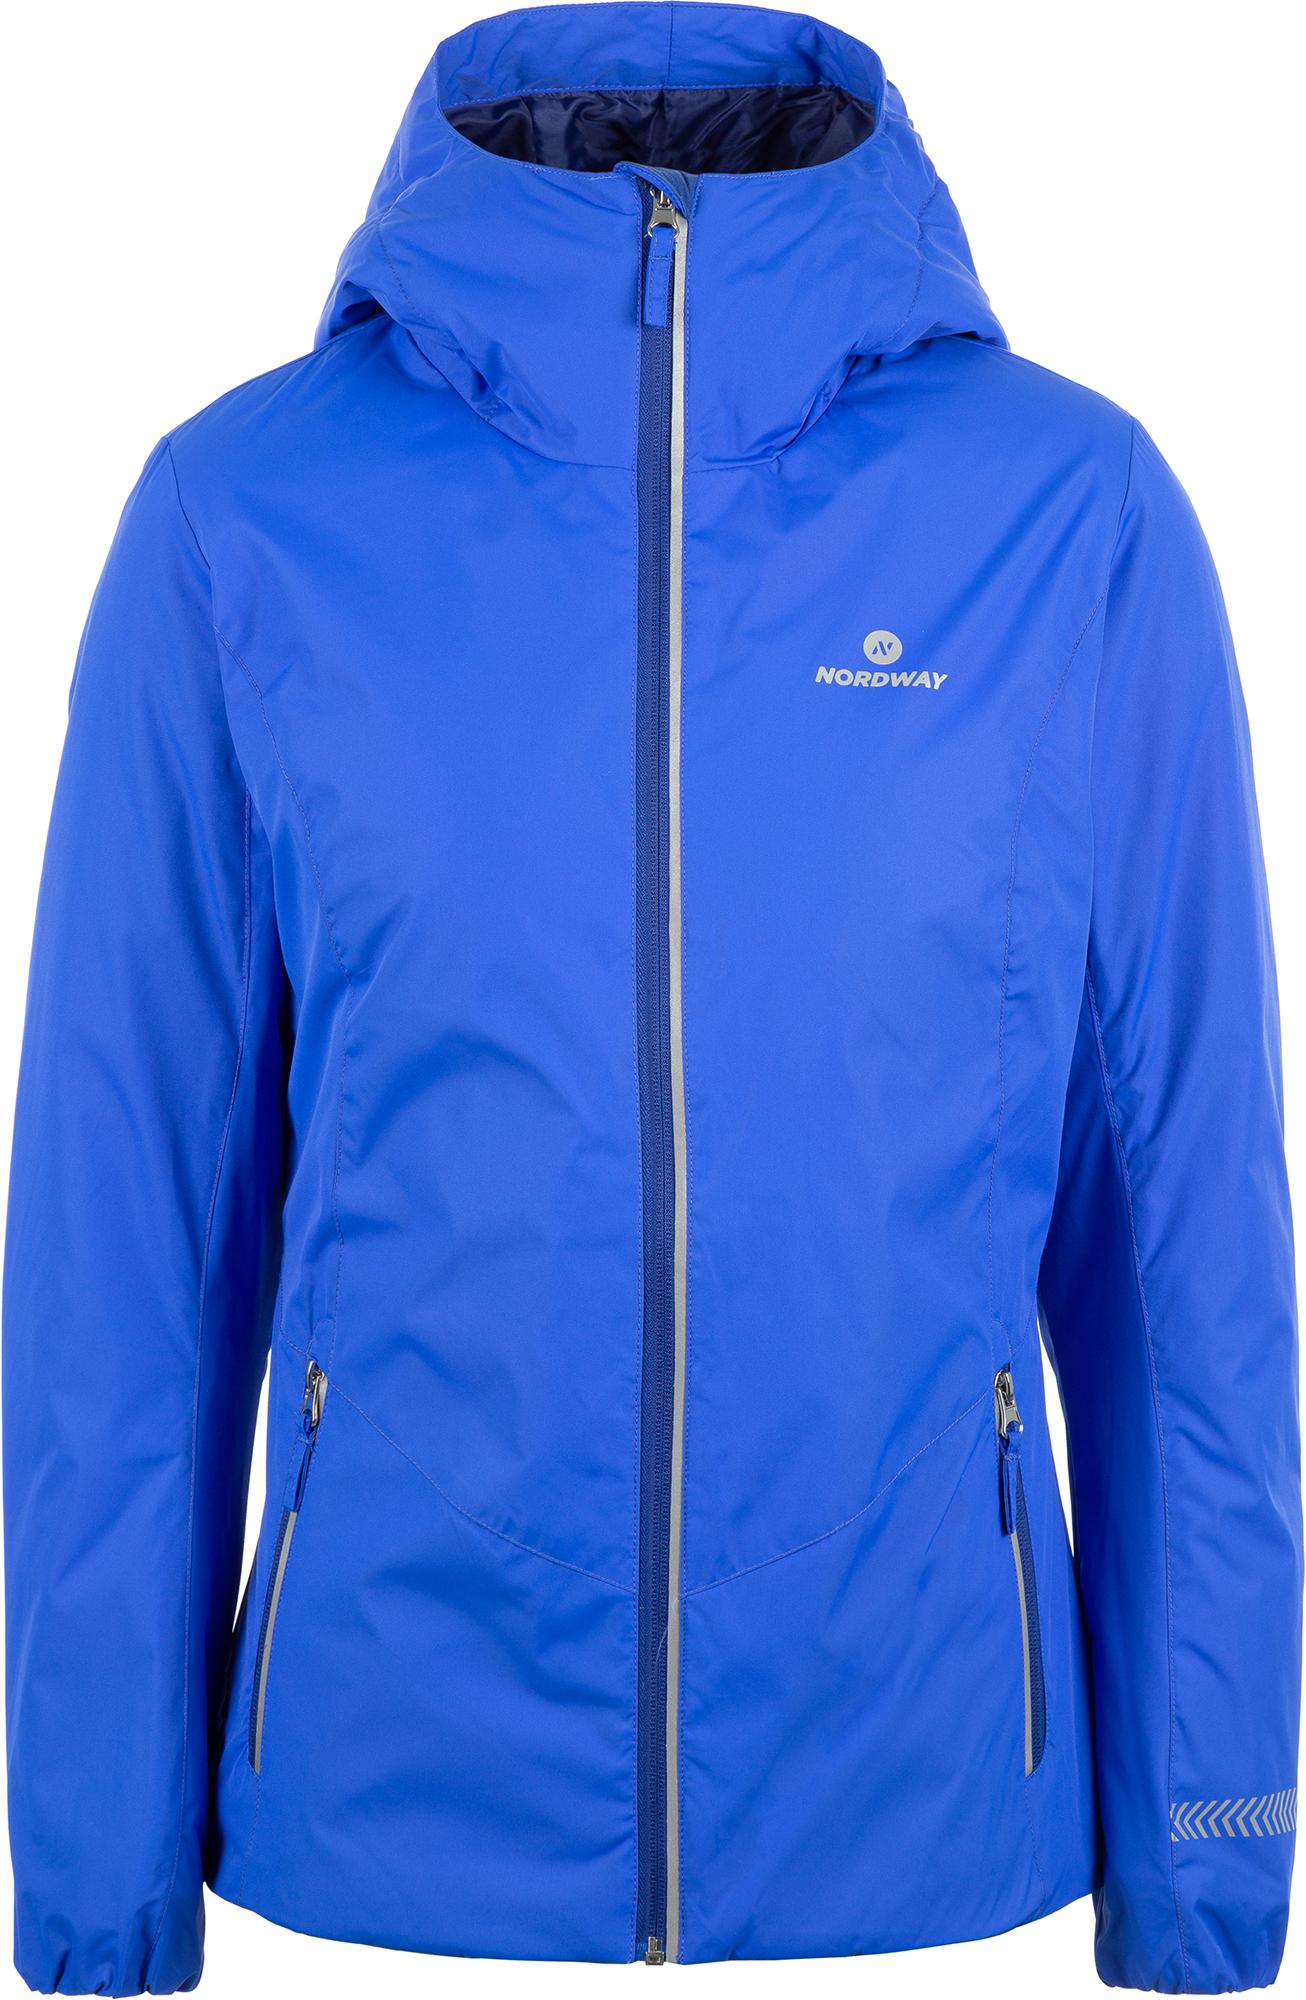 Nordway Куртка утепленная женская Nordway, размер 46 nordway куртка утепленная мужская nordway размер 46